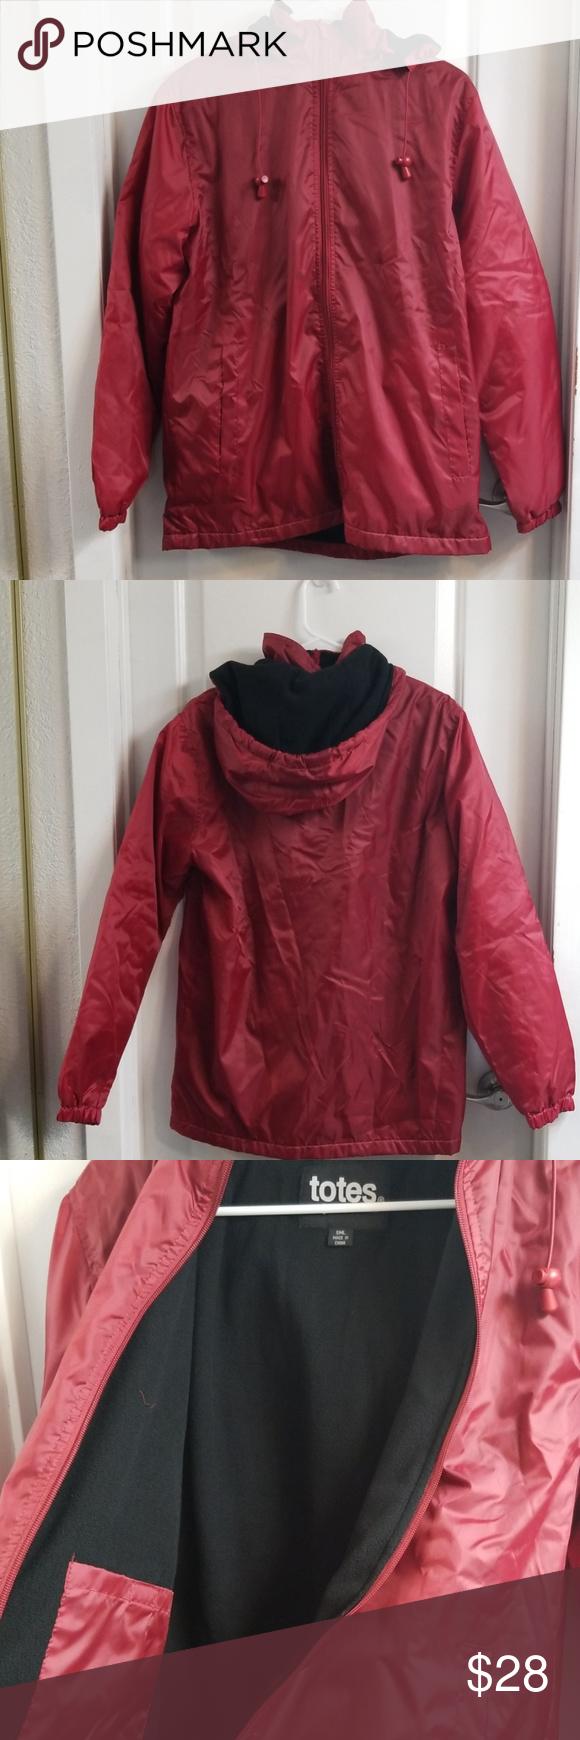 Ladies Totes Fleece Lined Rain Jacket Sz Small Womens Tote Jackets Rain Jacket